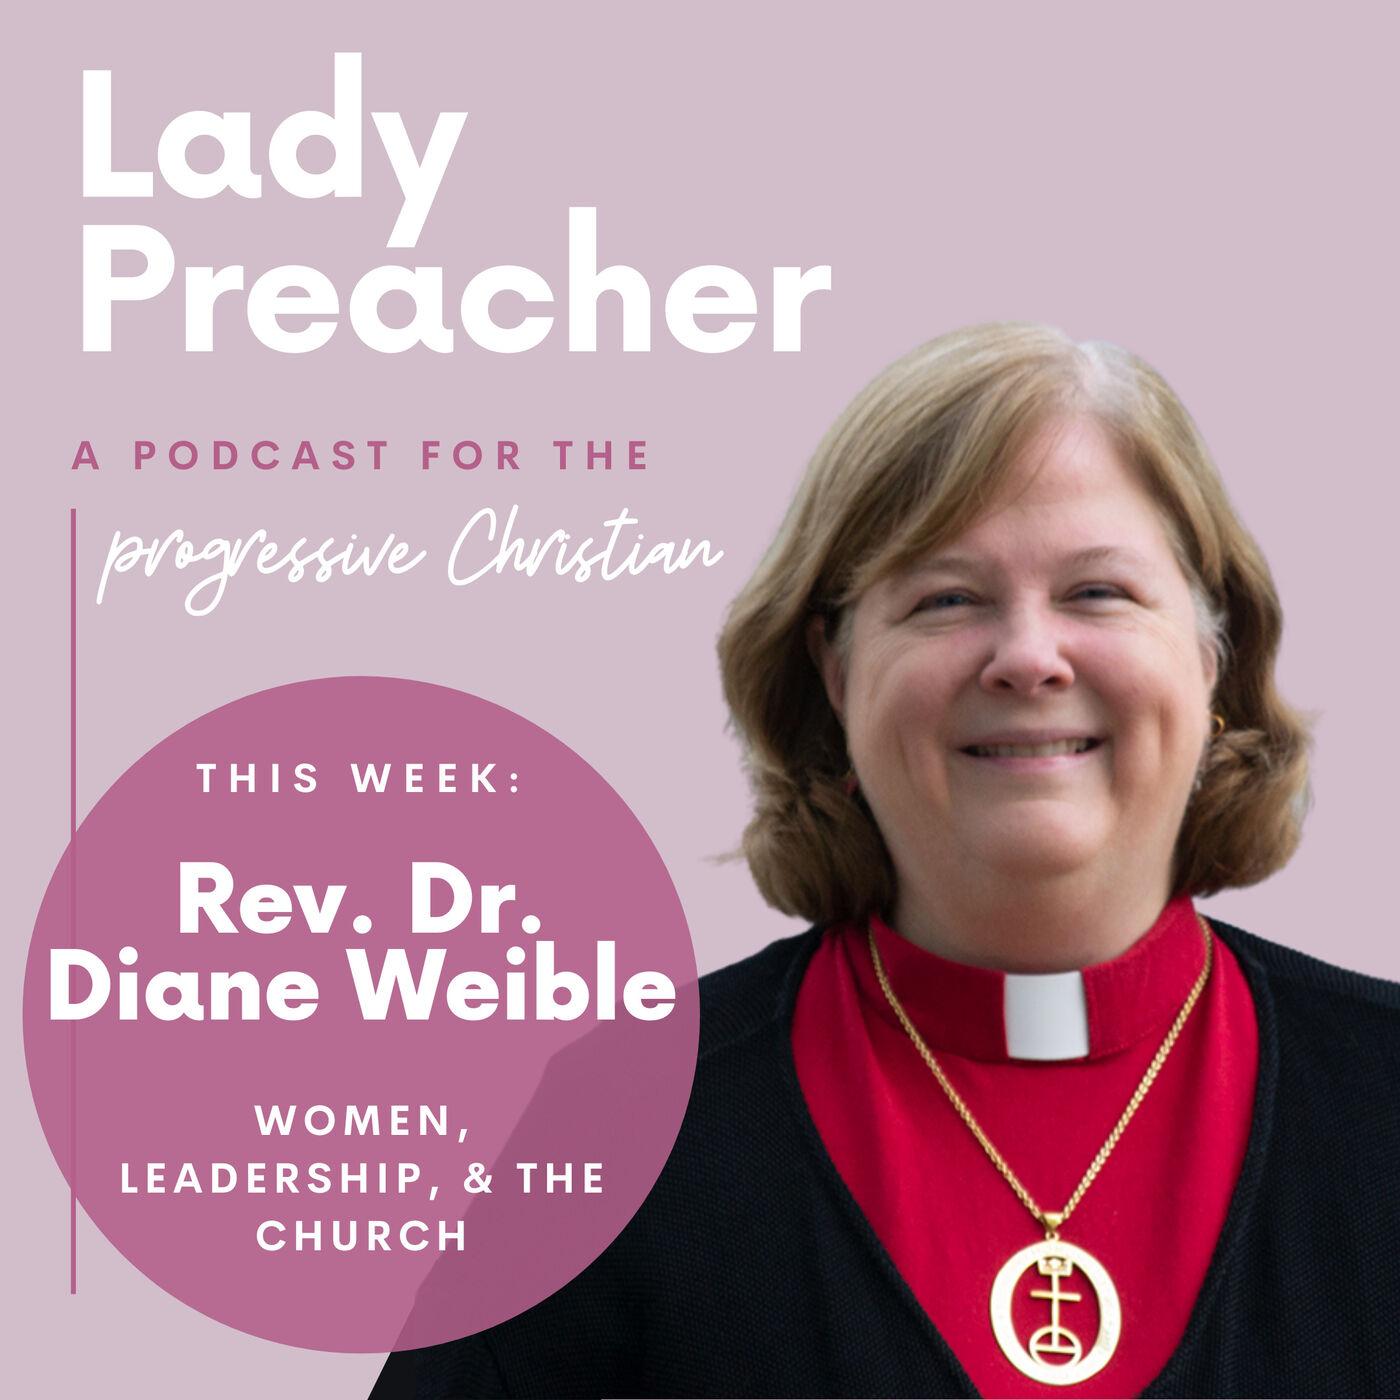 Rev. Dr. Diane Weible: Women, Leadership, & the Church